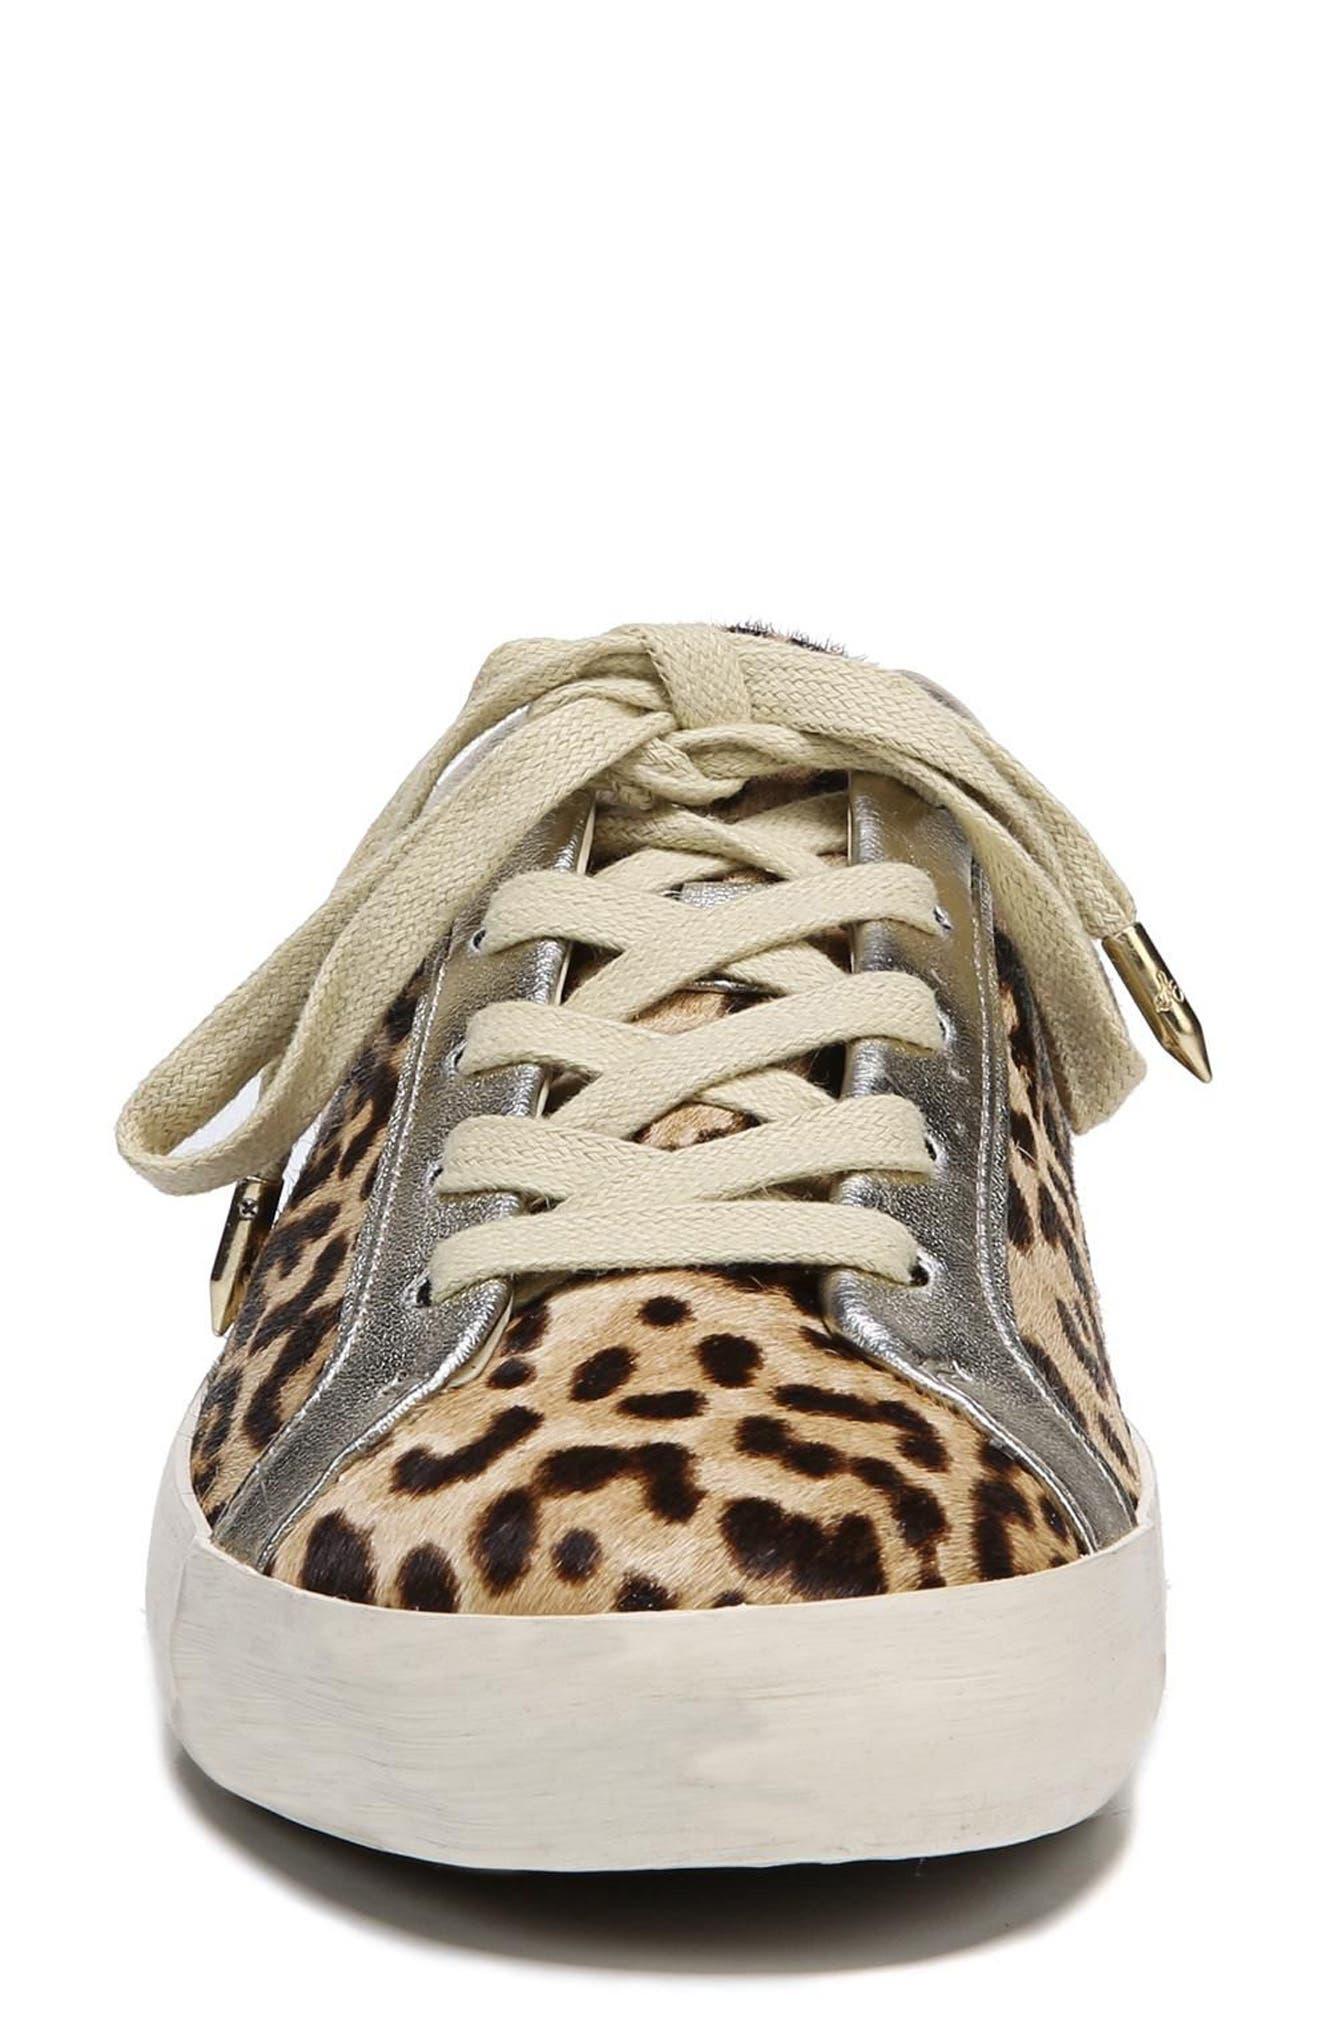 Britton 2 Sneaker,                             Alternate thumbnail 4, color,